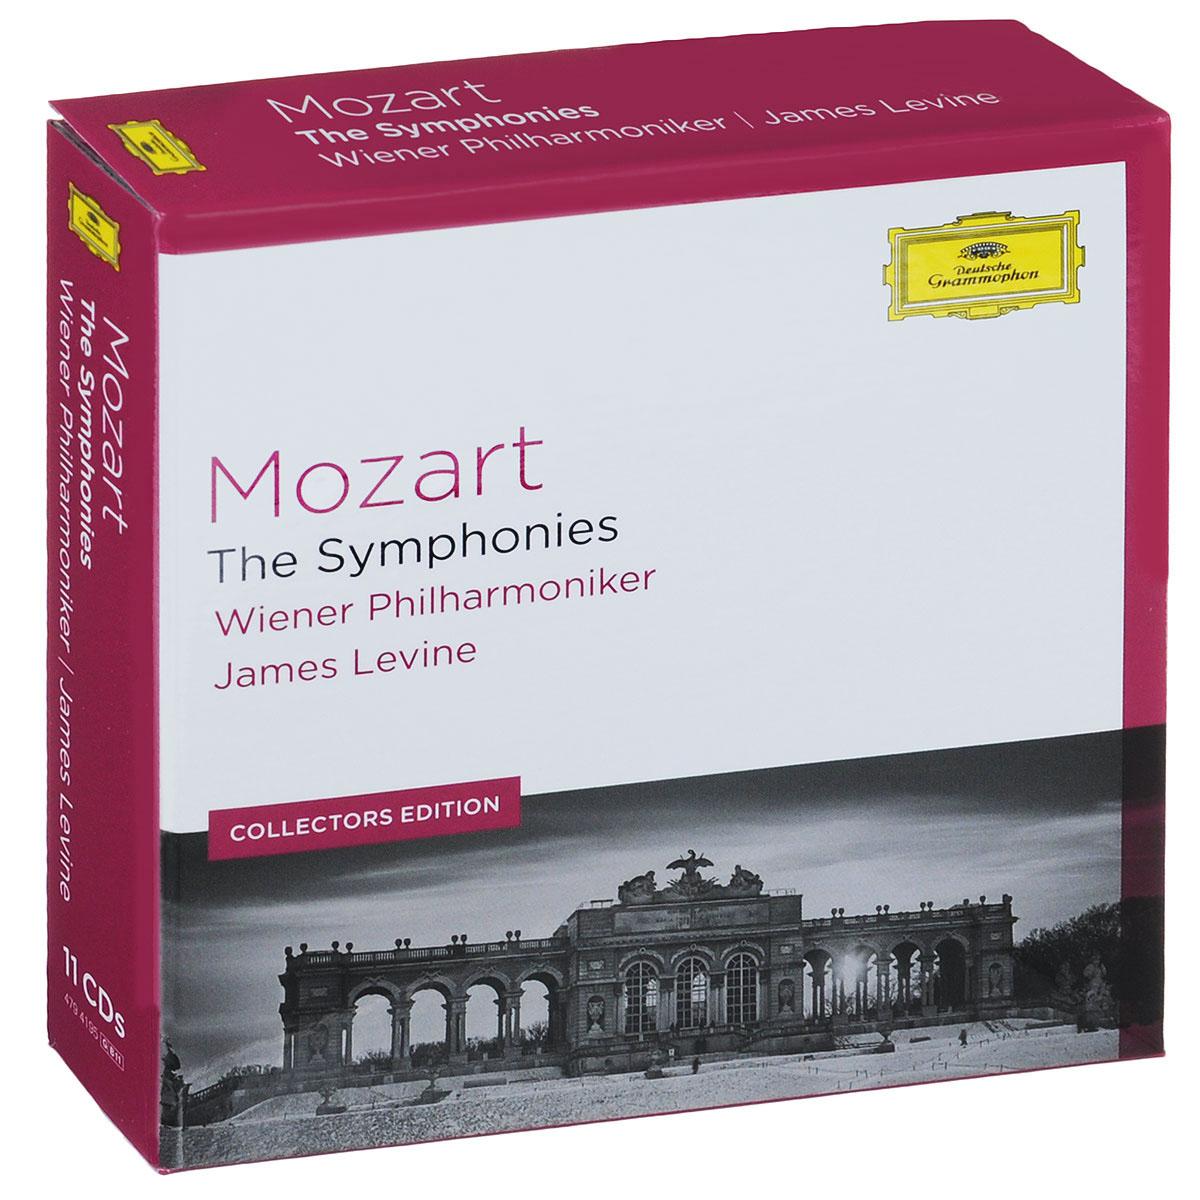 Wiener Philharmoniker James Levine. Wiener Philharmoniker. Mozart. The Symphonies (Collectors Edition) (11 CD)